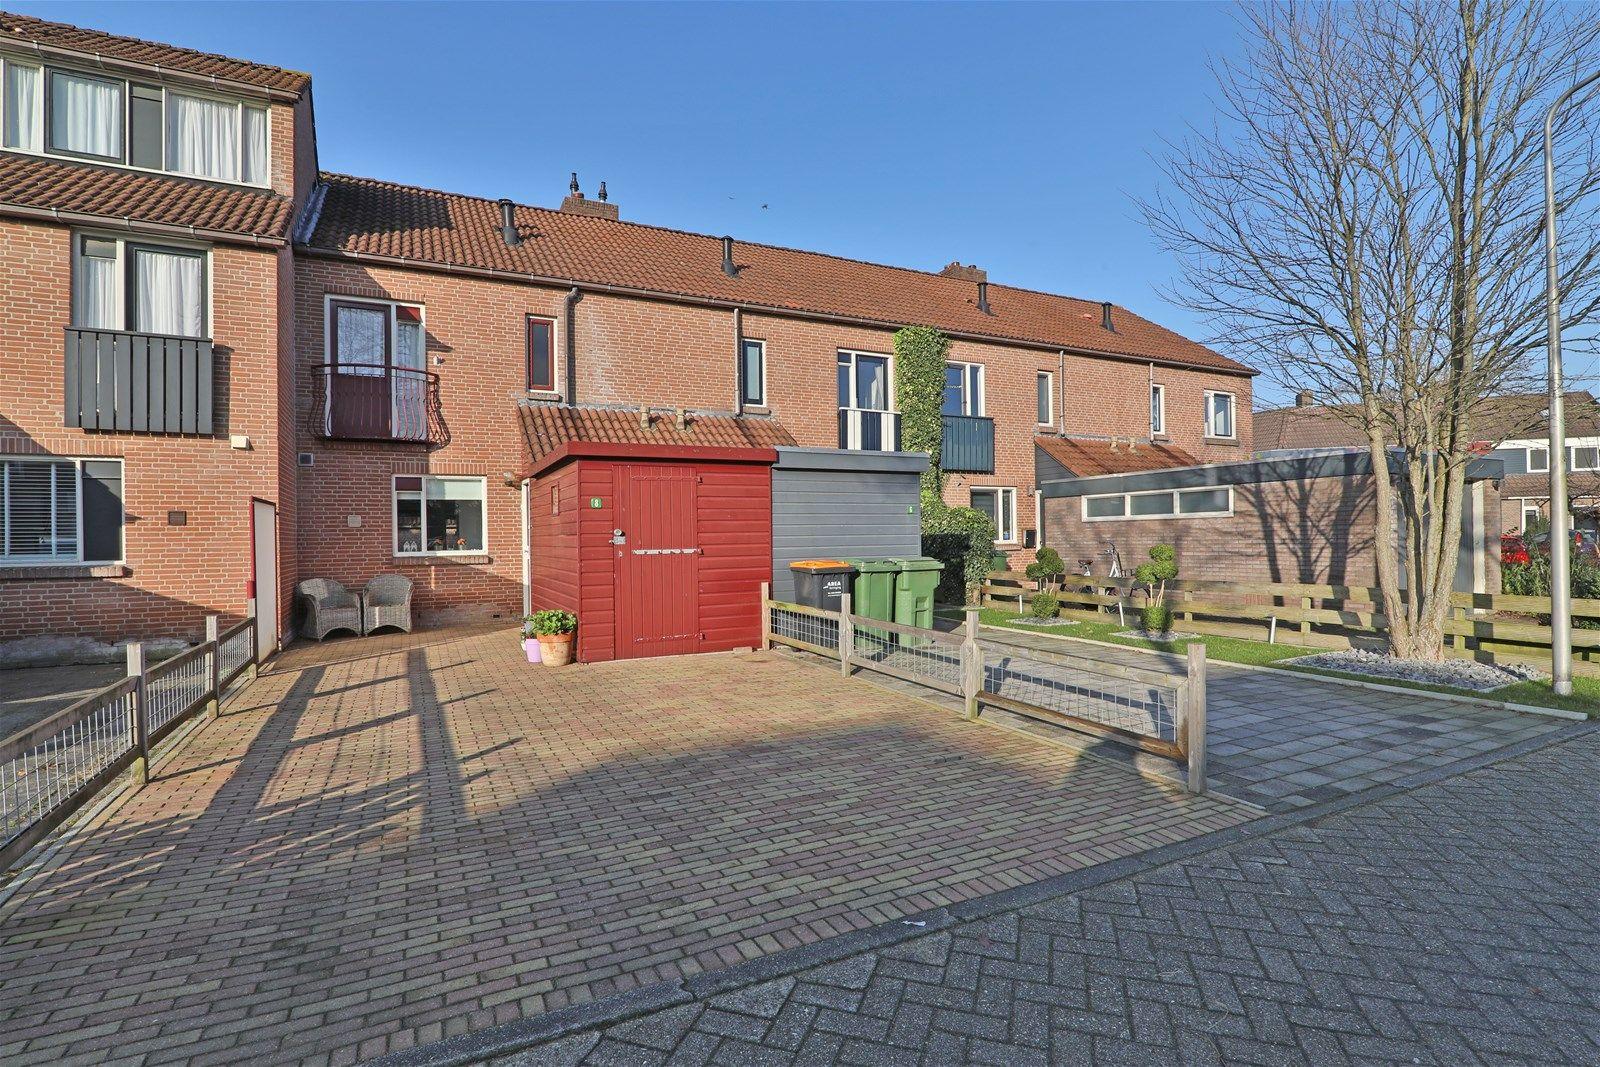 Mantinghstraat 8, Hoogeveen